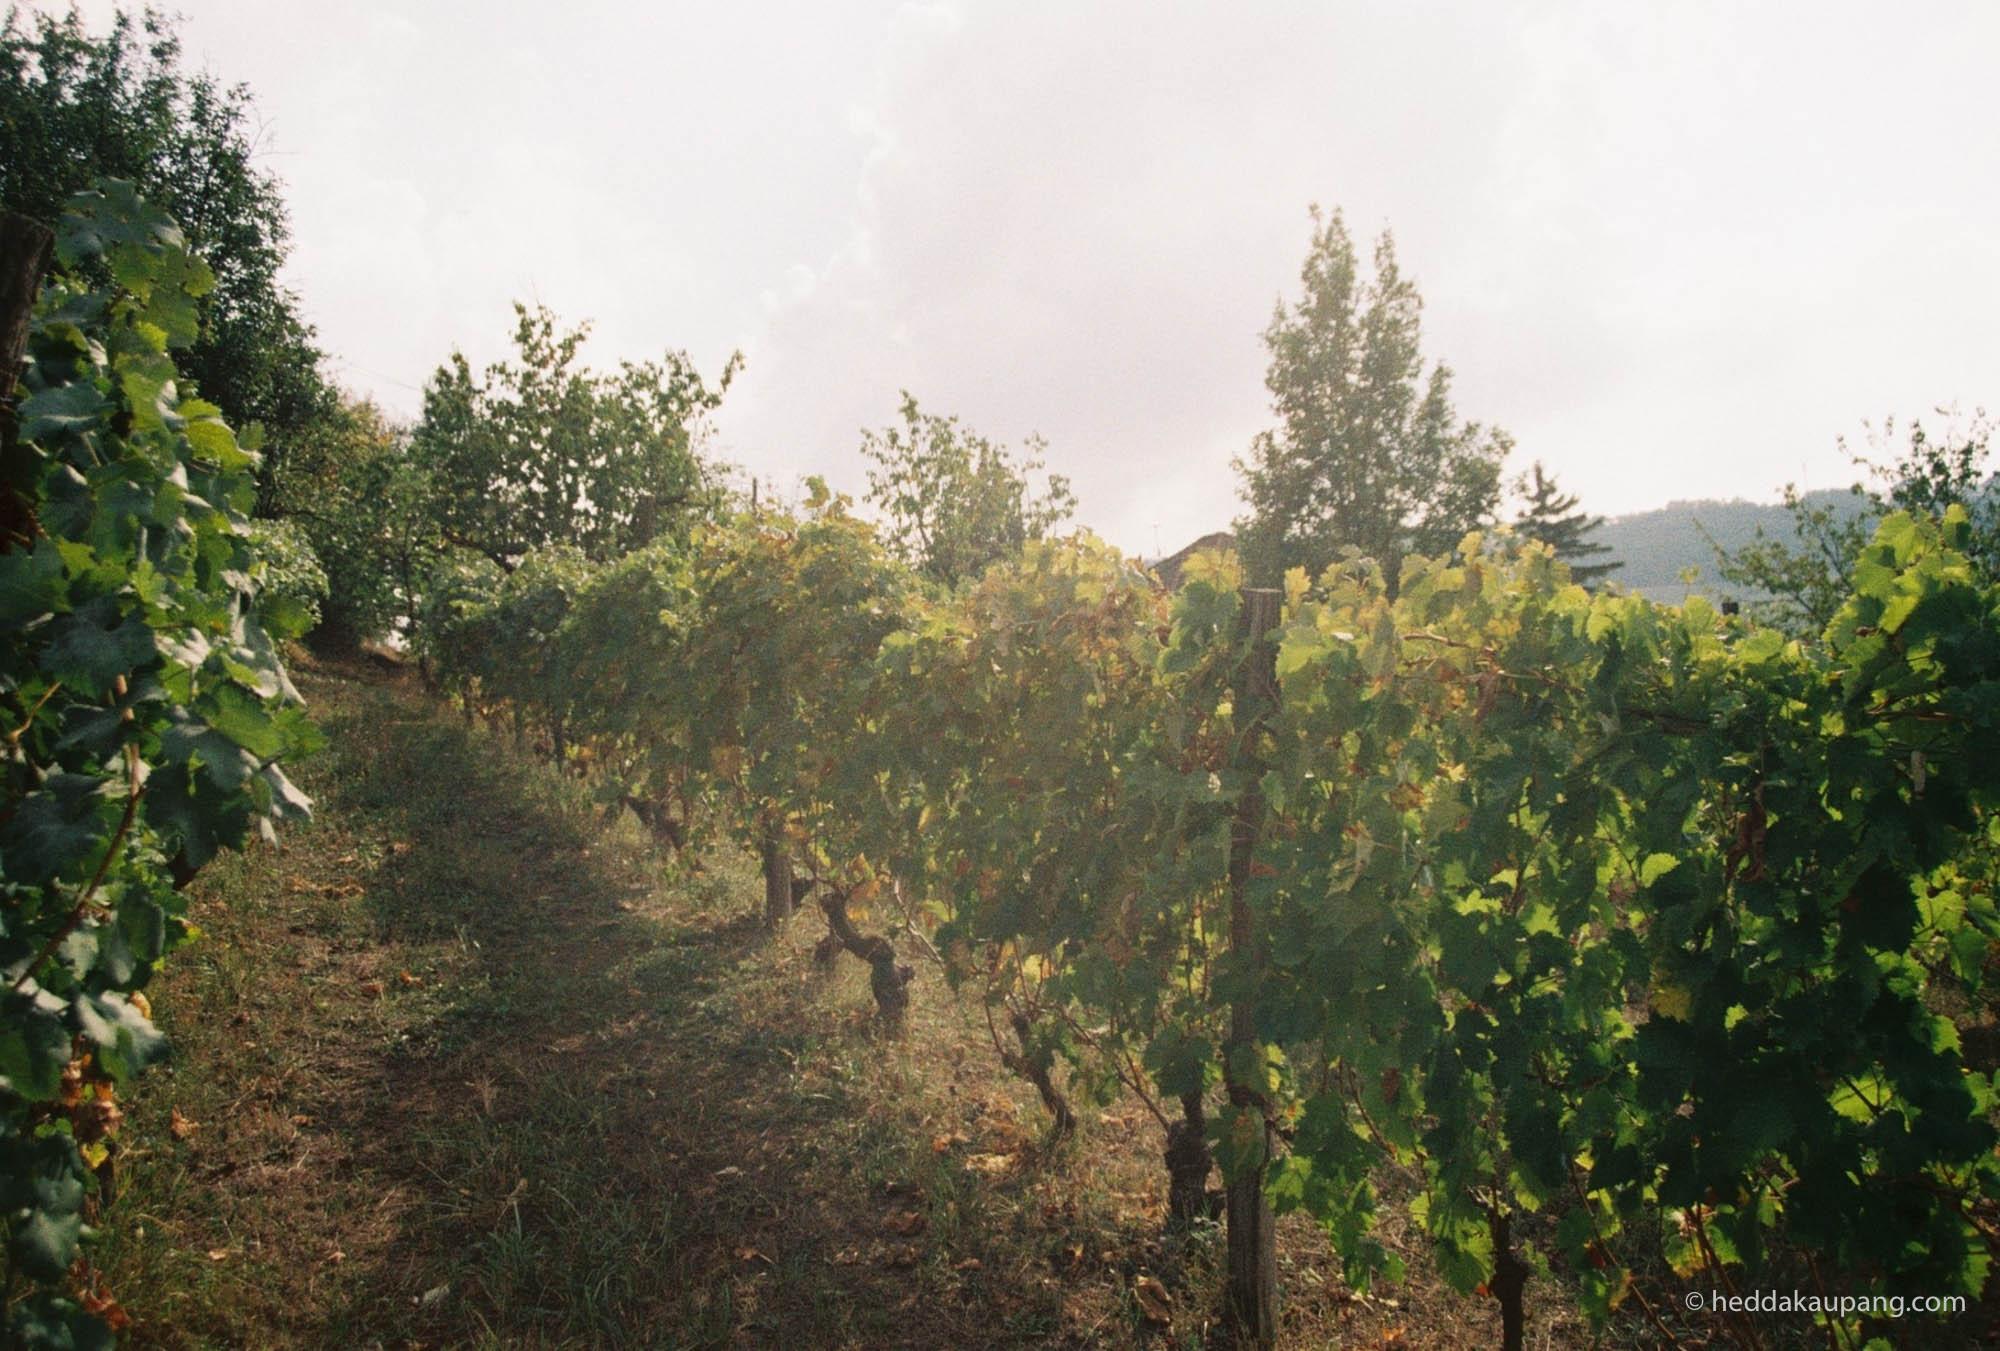 The wine ranks of Valli Unite.